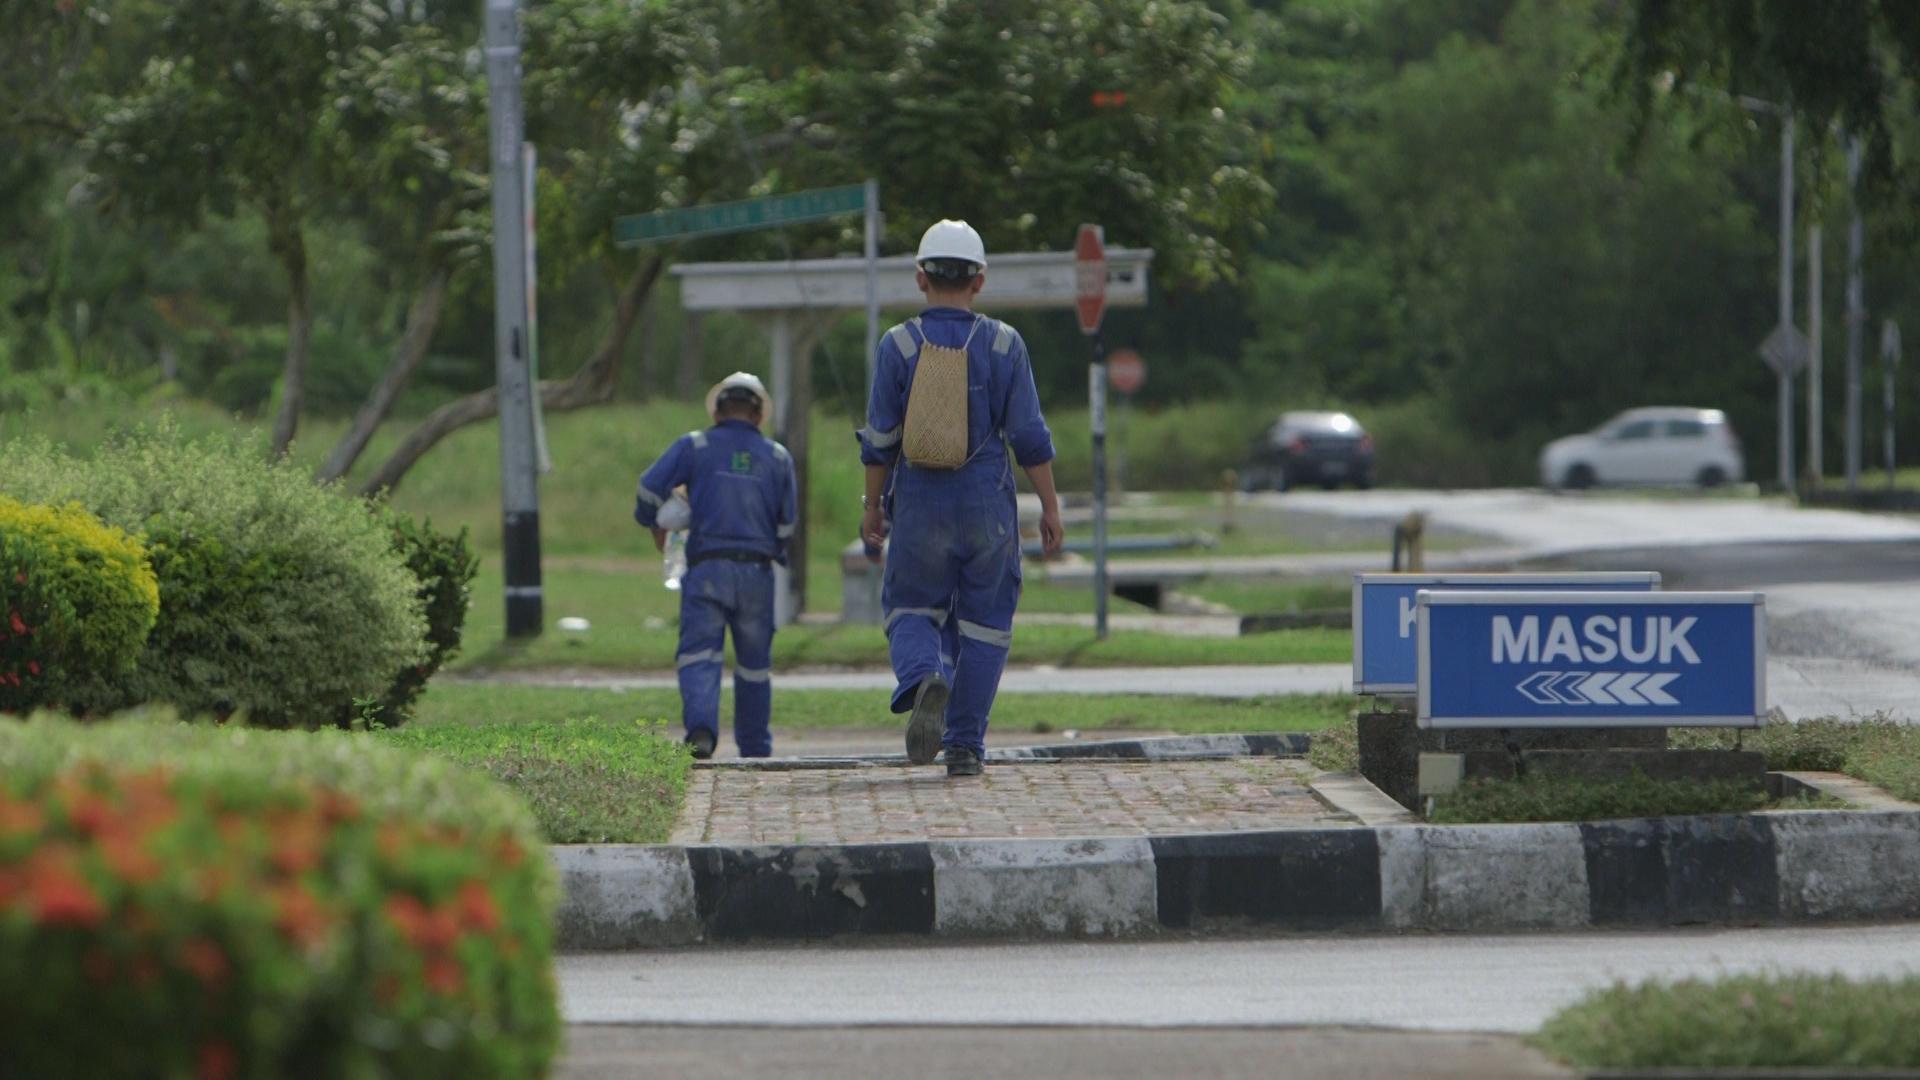 NEMBIAK NEGRI MINYAK: THE BOYS OF OIL CITY